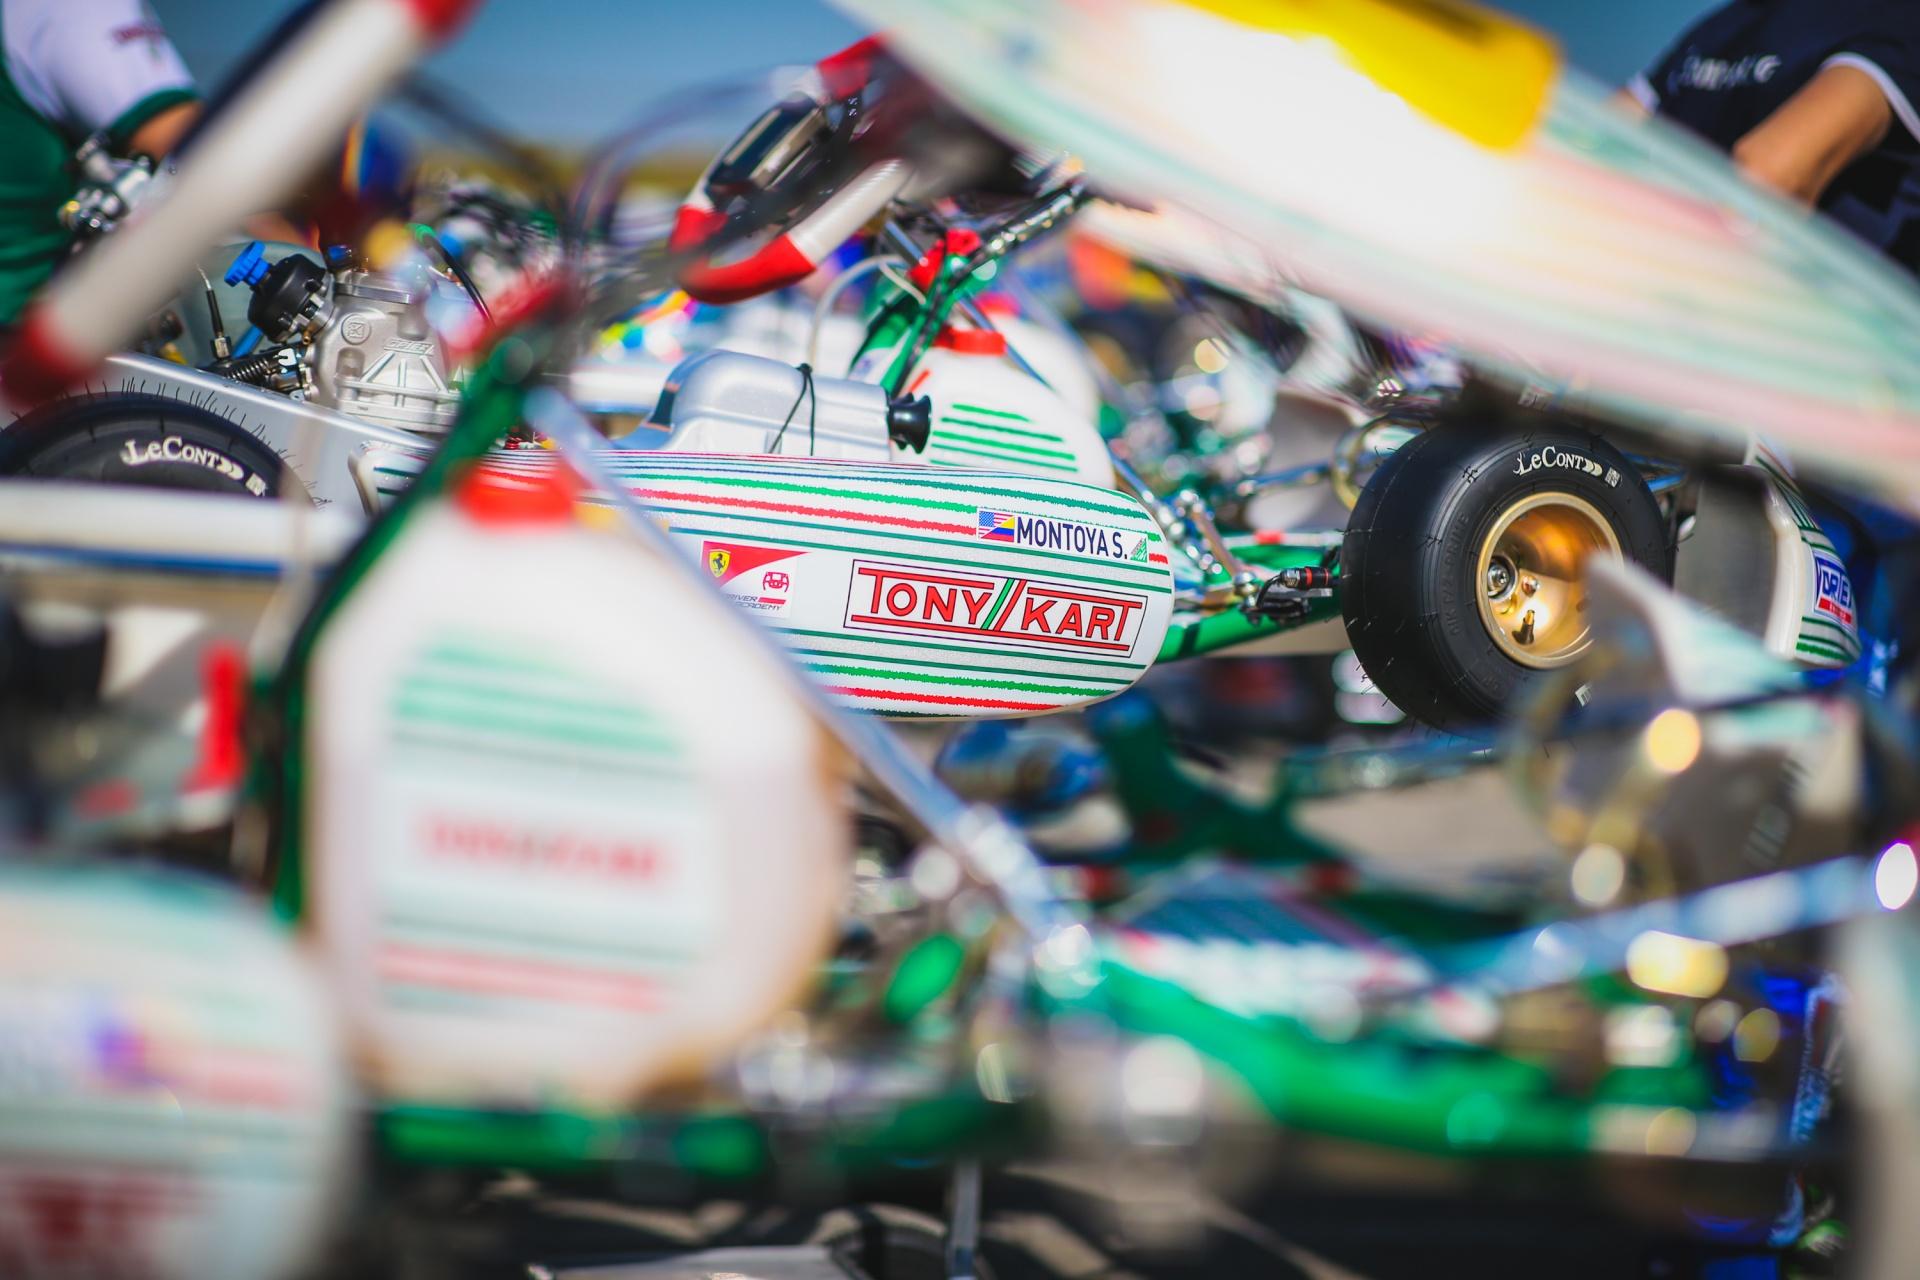 Clamoroso alla WSK Open Cup: Travisanutto e Hiltbrand con Tony Kart Racing Team!